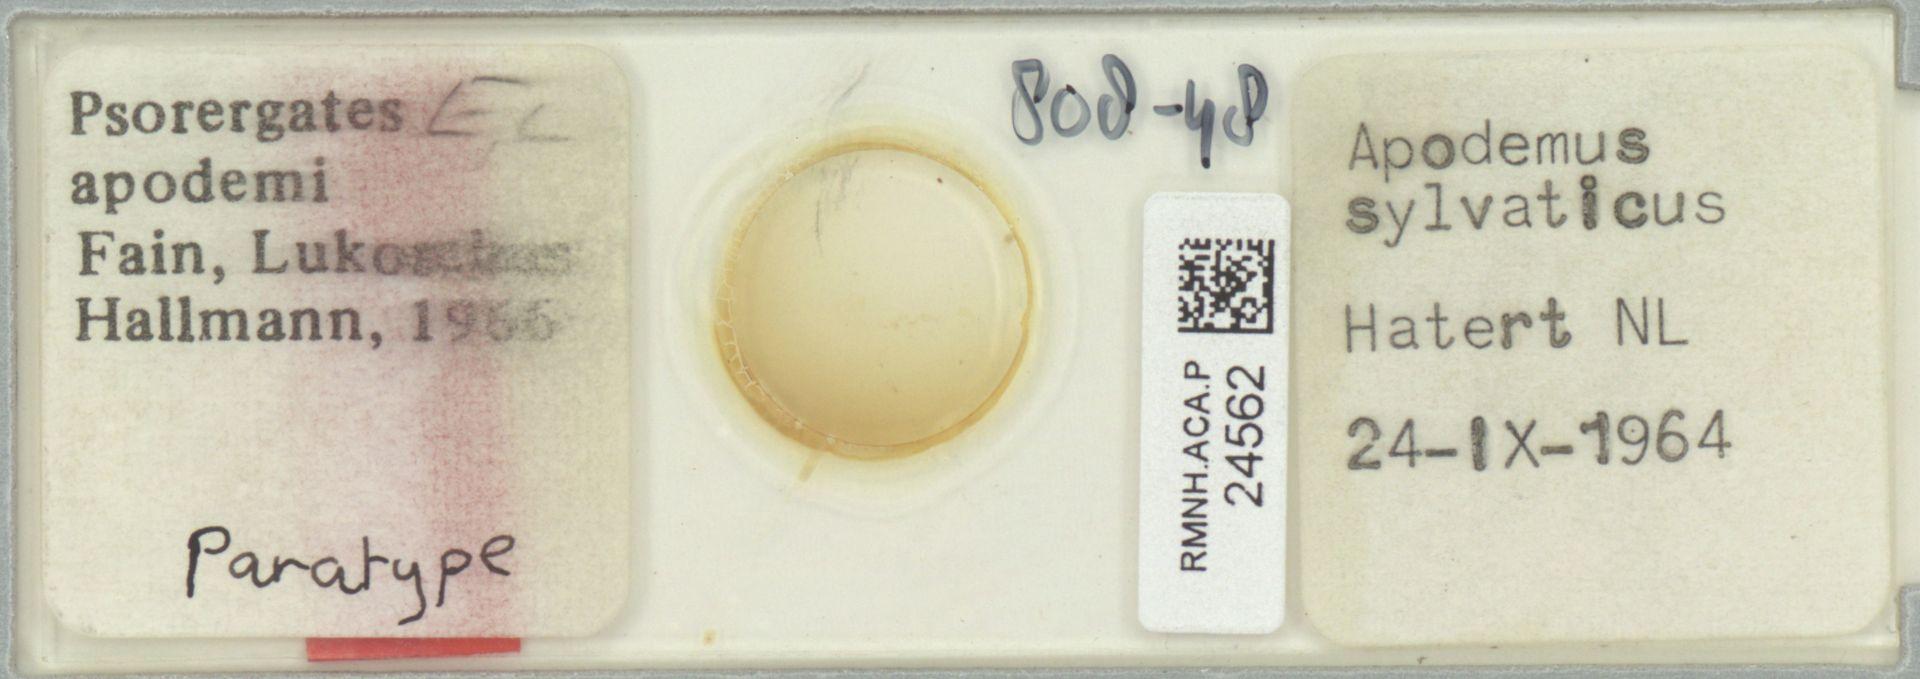 RMNH.ACA.P.24562 | Psorergates apodemi Fain, Lukoschus, Hallmann, 1966